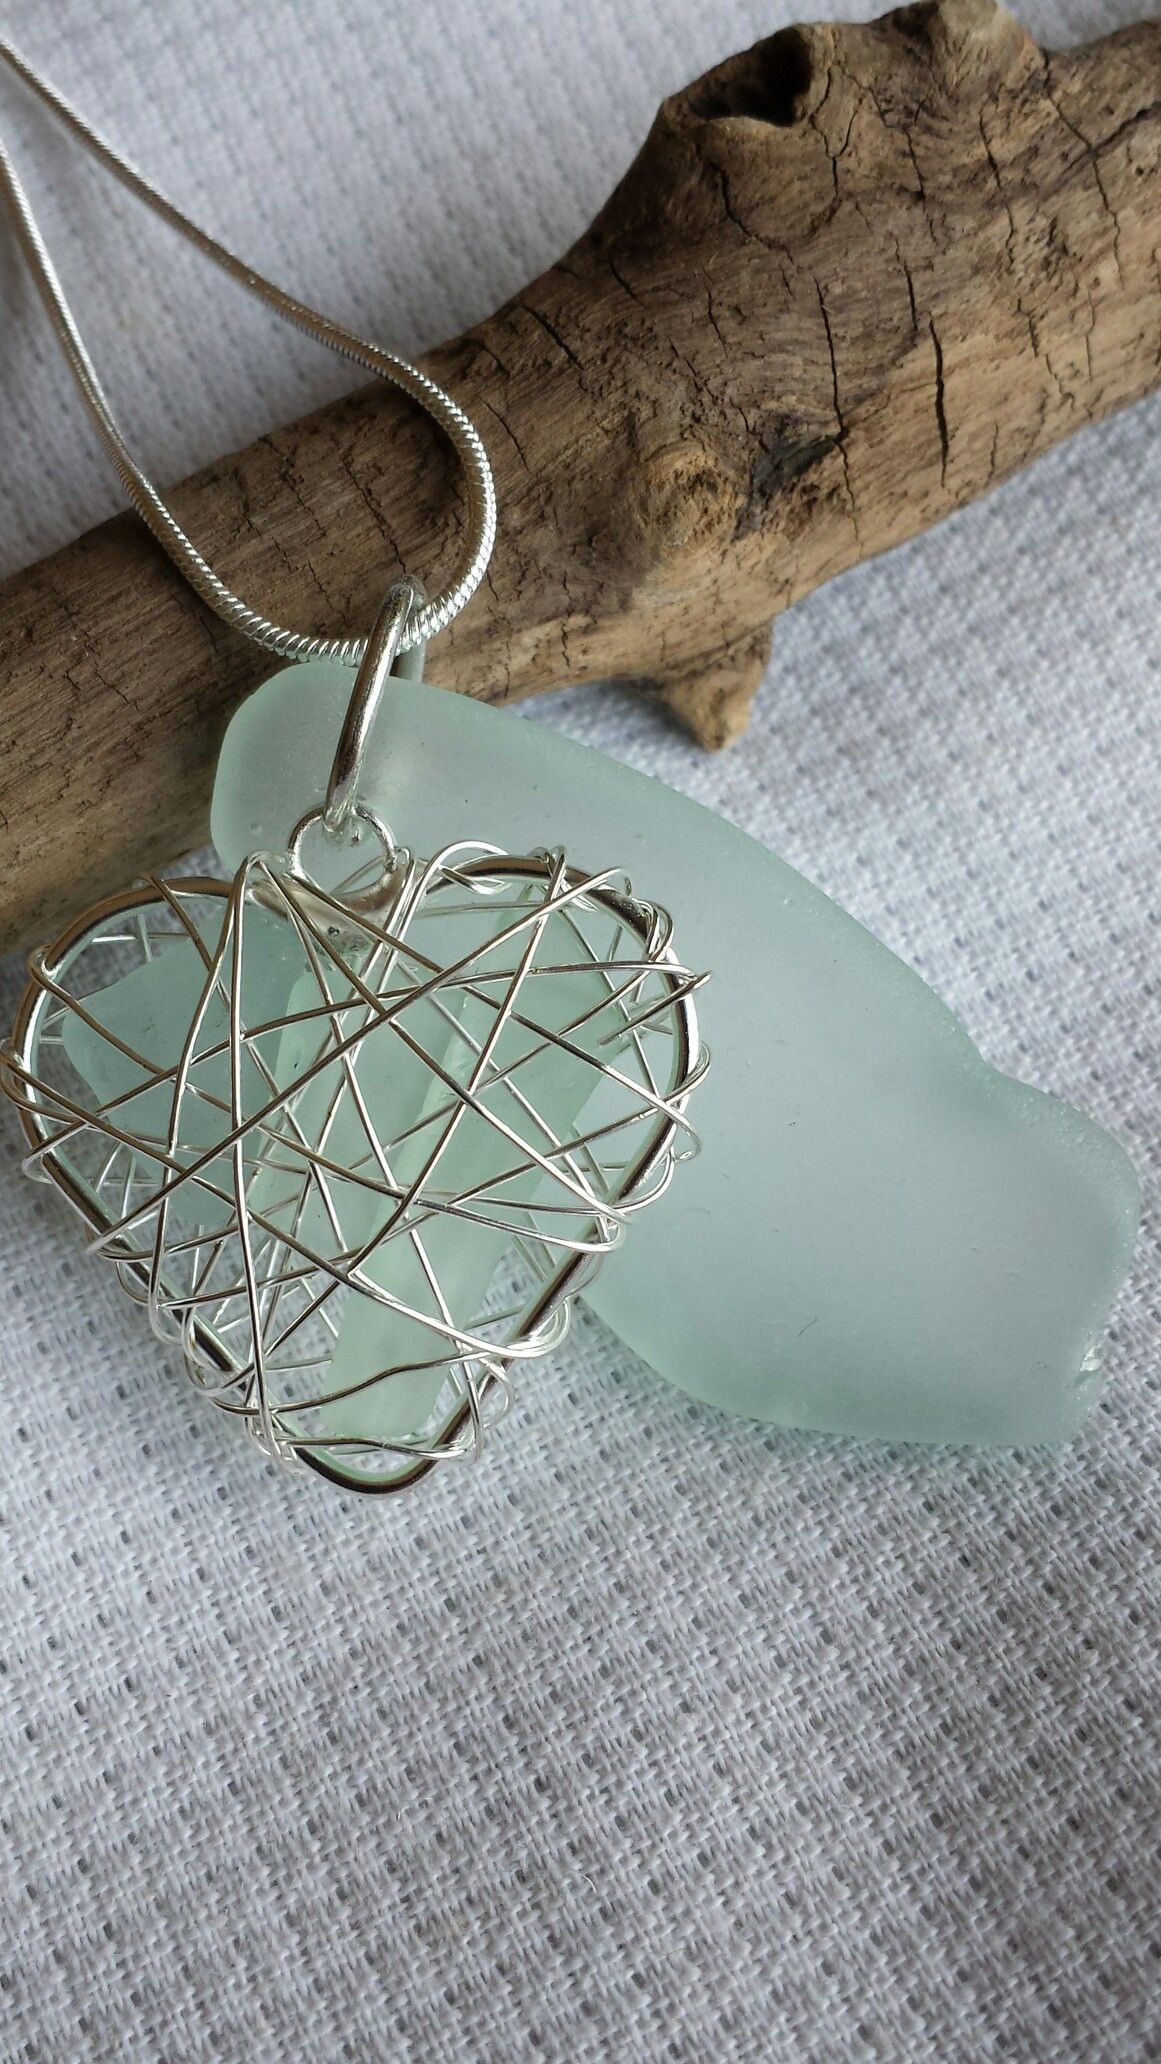 Pin by Kristina Mobley on Crafts/Ideas/DIY | Pinterest | Iowa, Glass ...